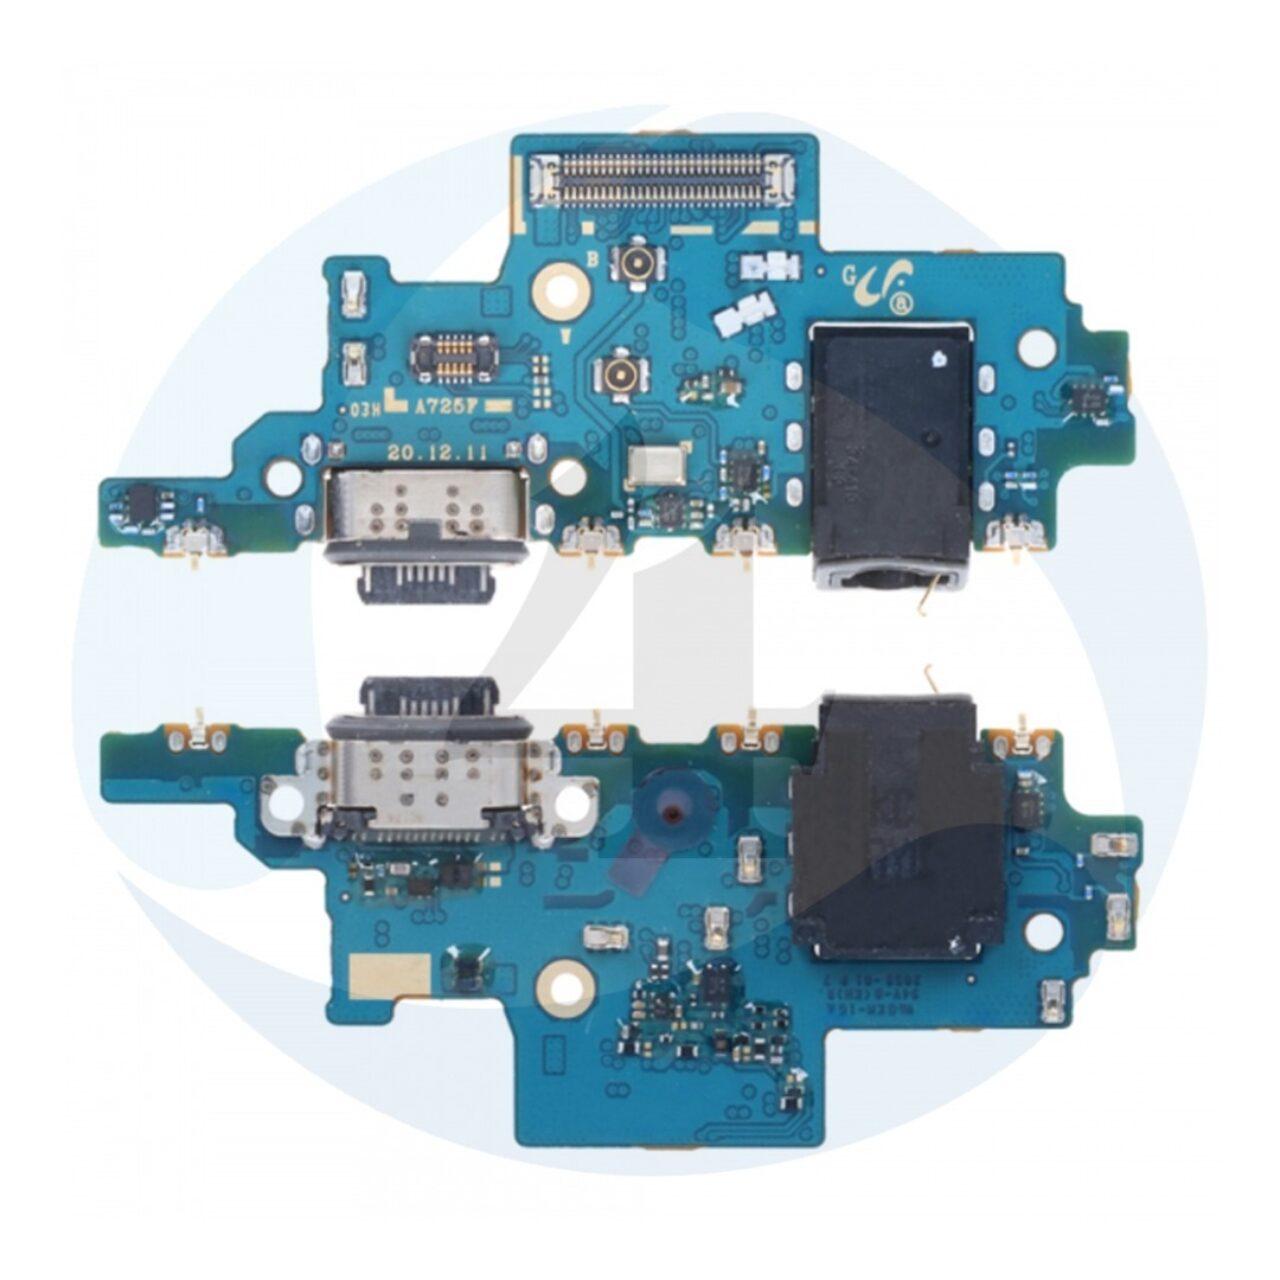 Samsung galaxy A72 charging port connector